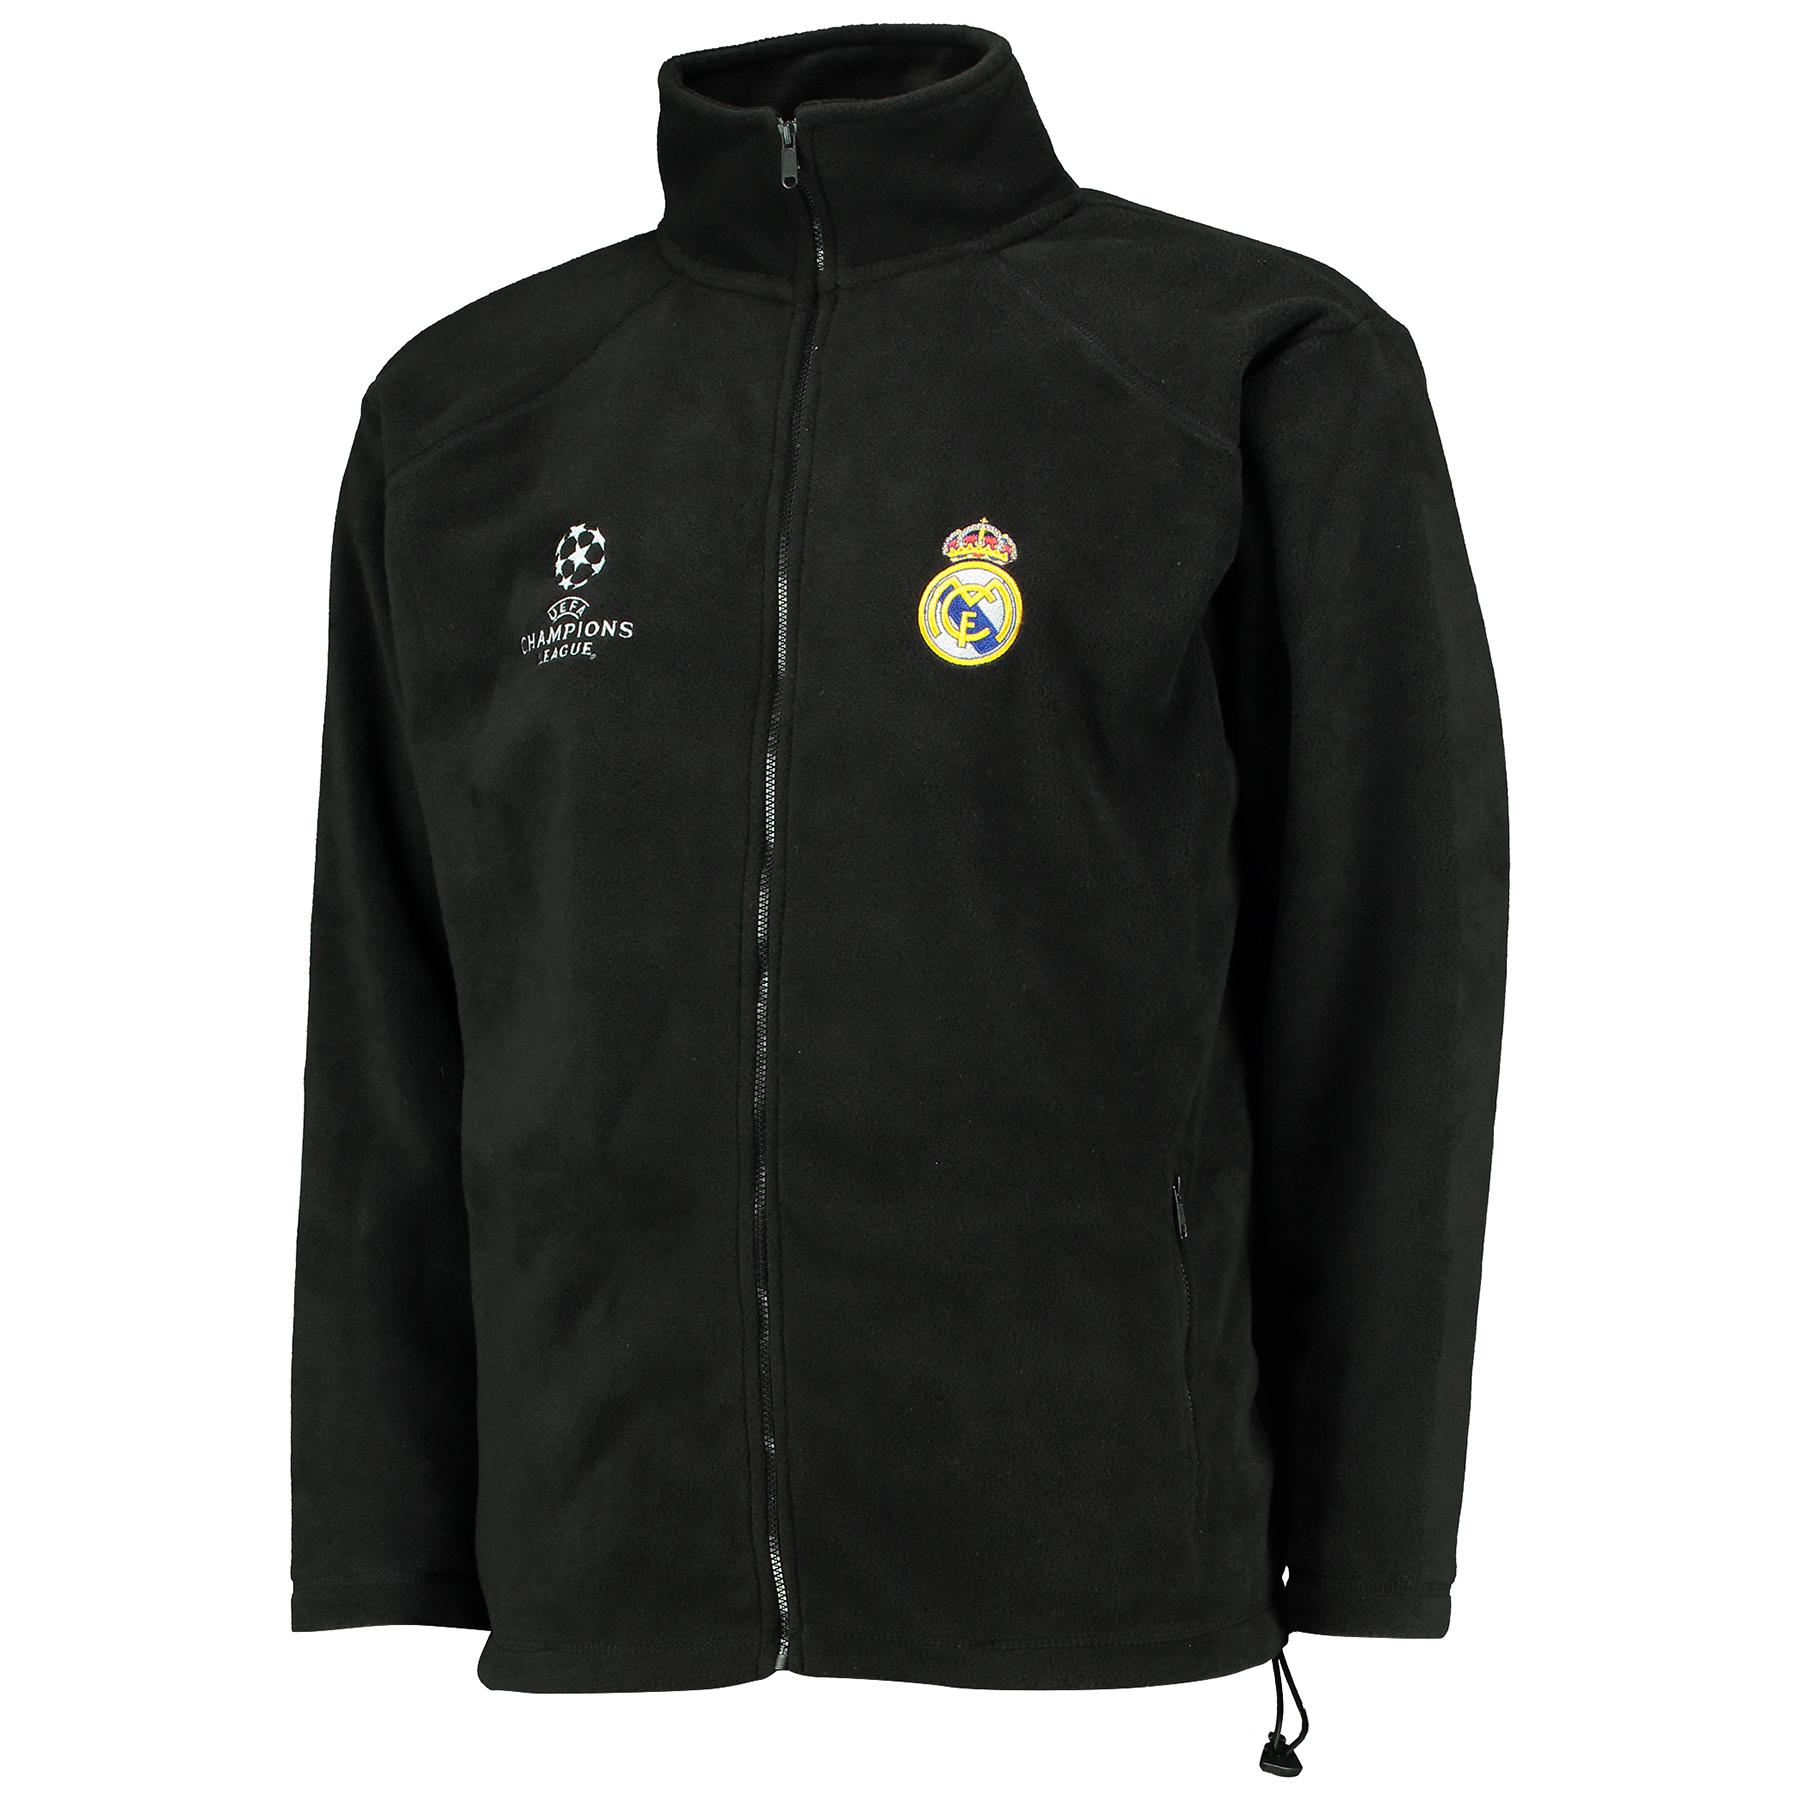 Real Madrid UEFA Champions League Soft Shell Jacket - Black - Mens